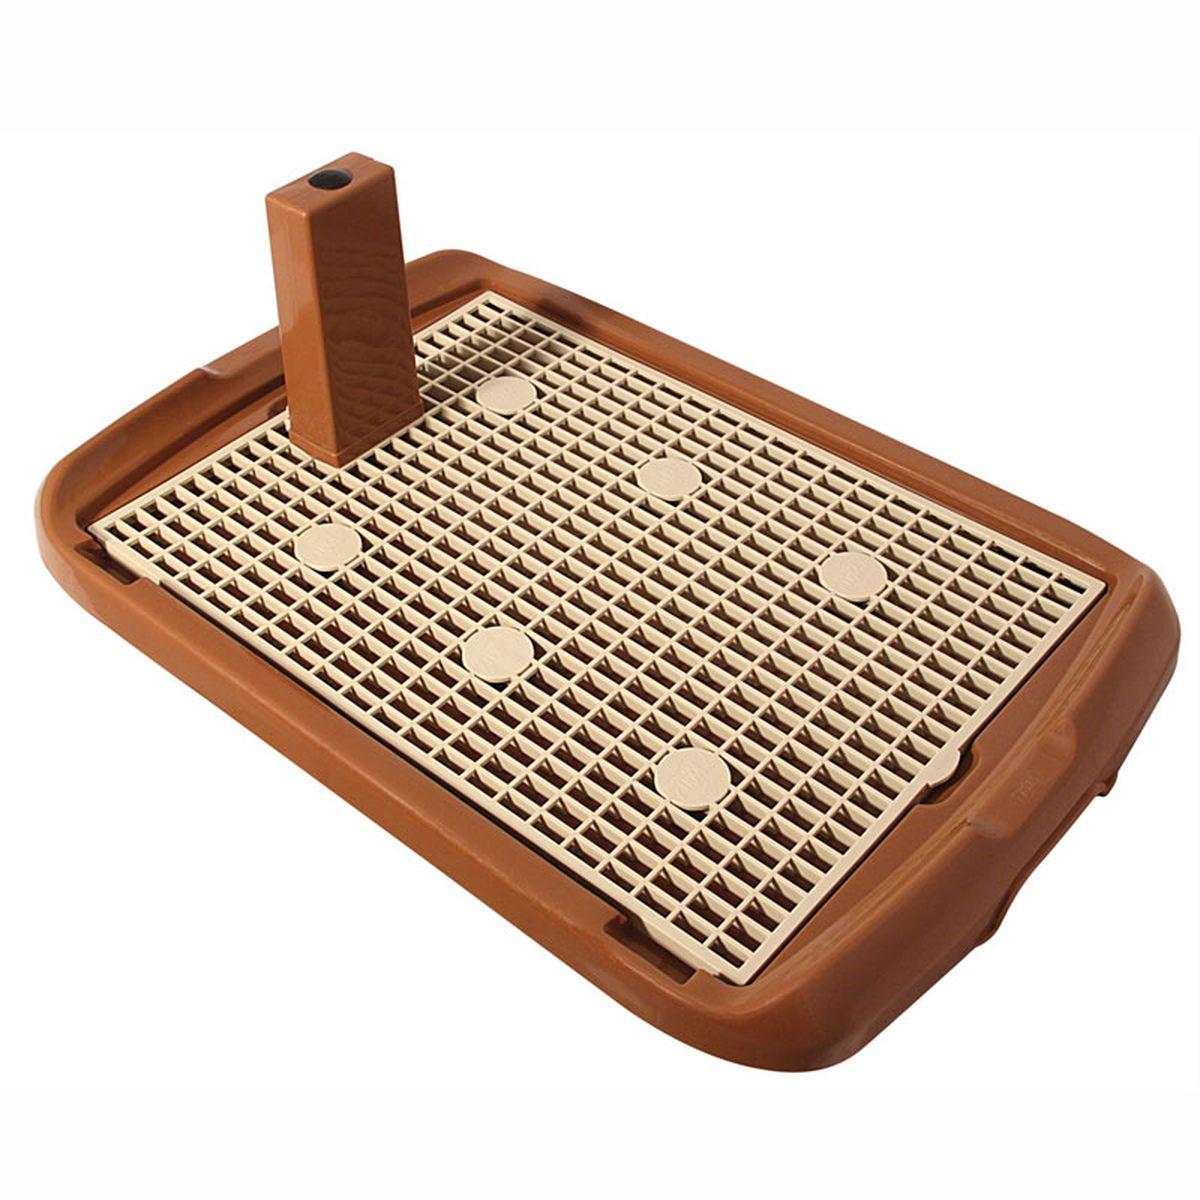 Туалет для собак Triol, со столбиком, цвет: коричневый, 60 х 40 х 4,5 см туалет для собак triol 48 х 42 х 4 см